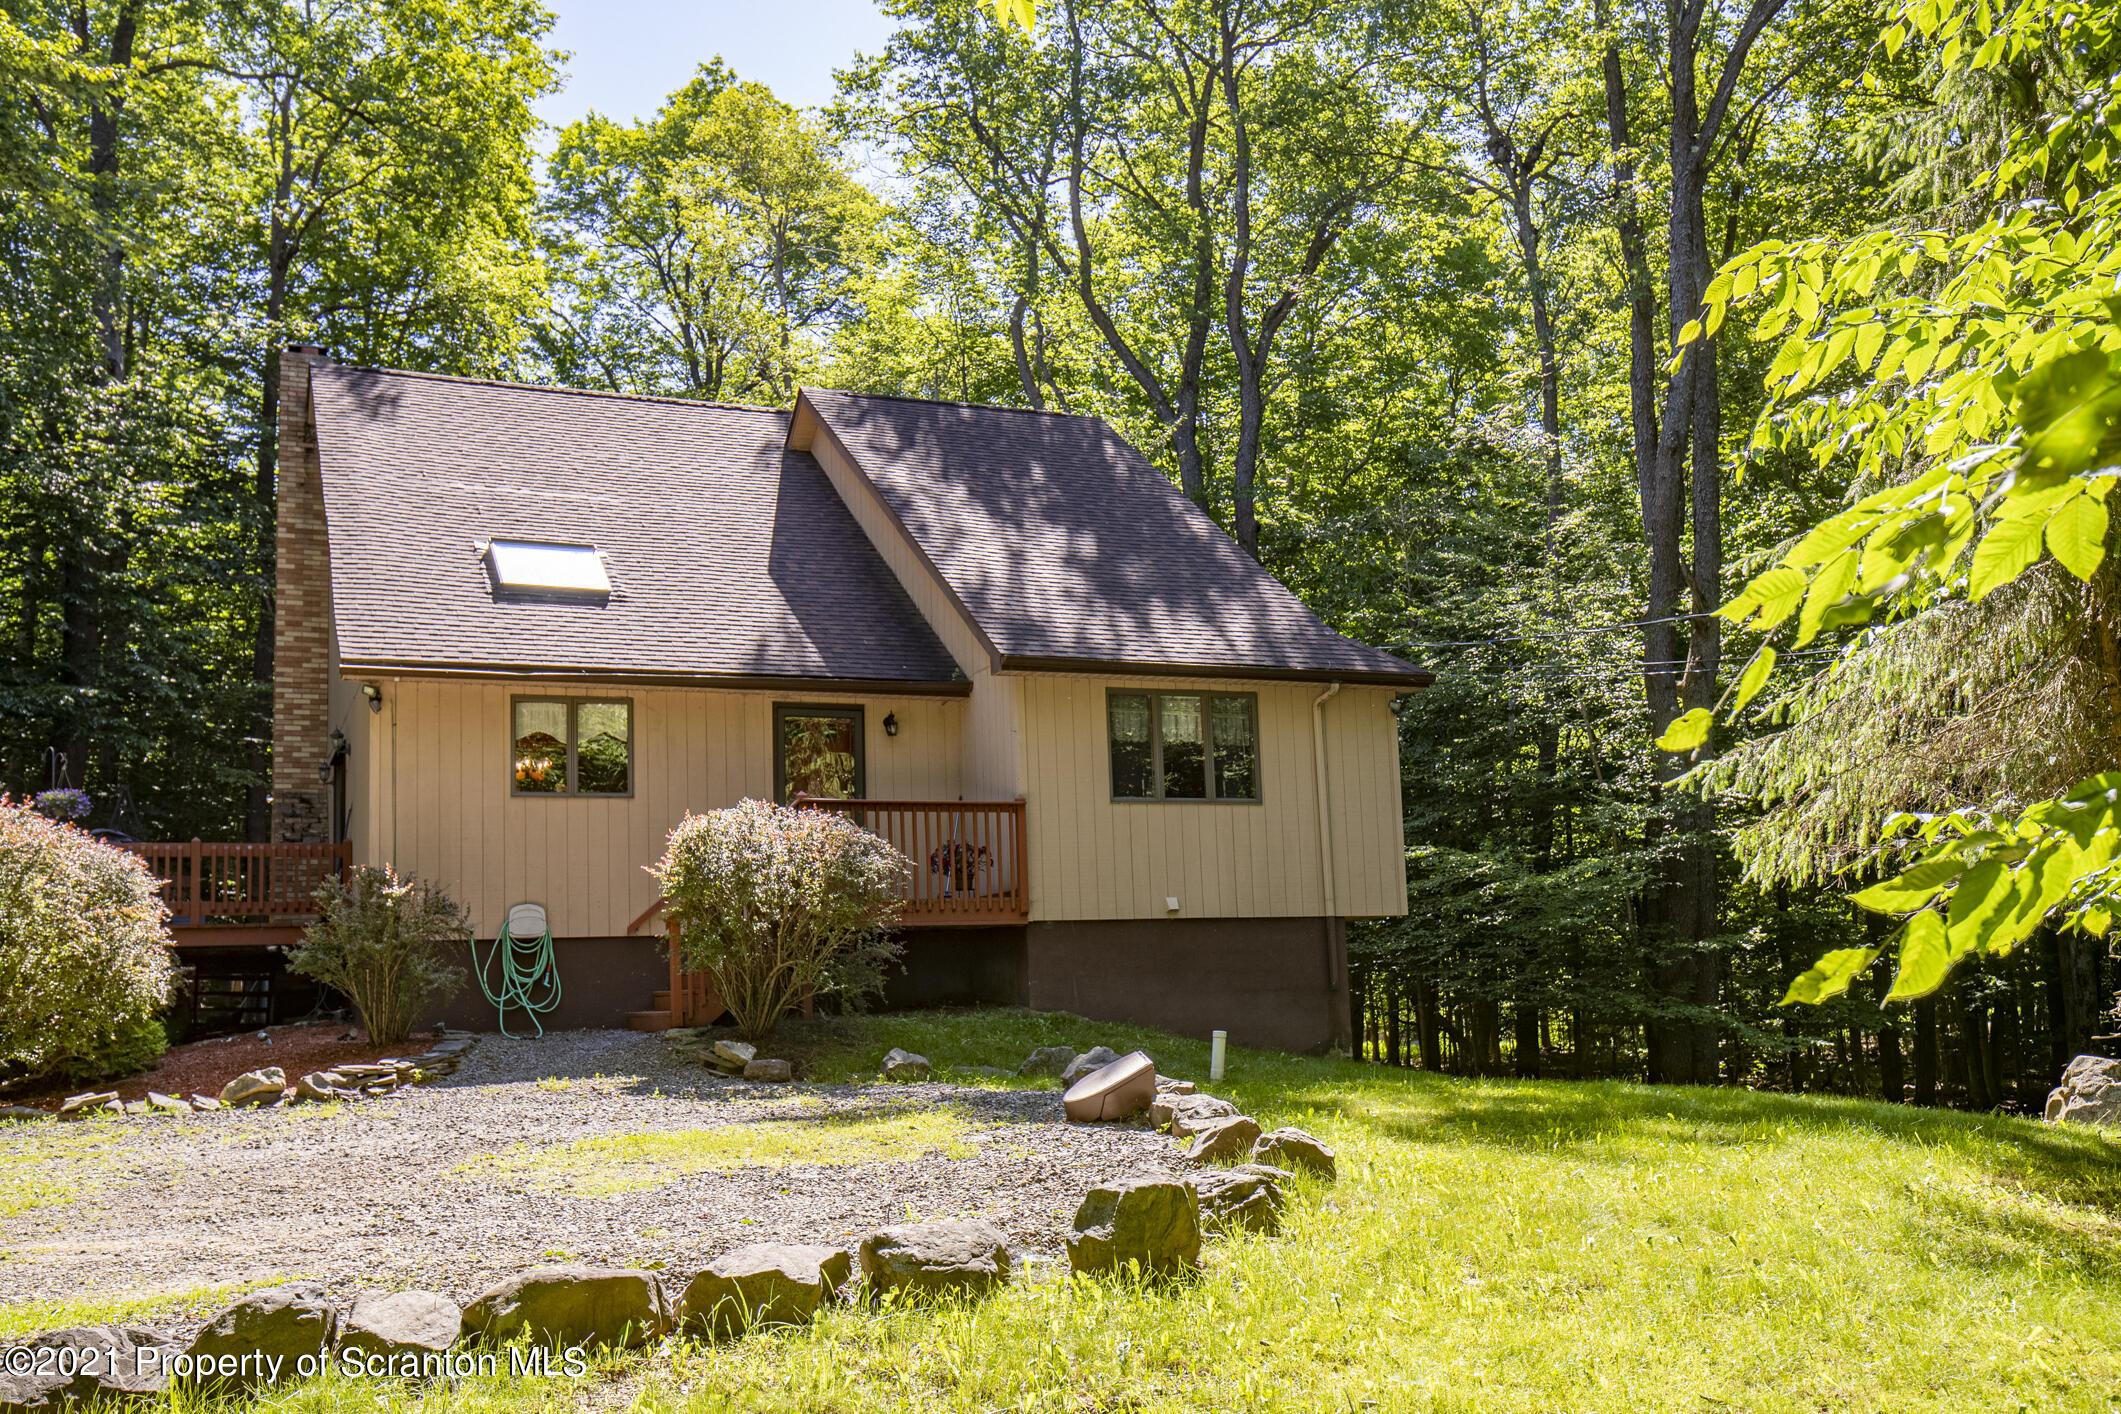 411 Packanack Dr, Clifton Twp, Pennsylvania 18424, 3 Bedrooms Bedrooms, 7 Rooms Rooms,2 BathroomsBathrooms,Single Family,For Sale,Packanack,21-2530